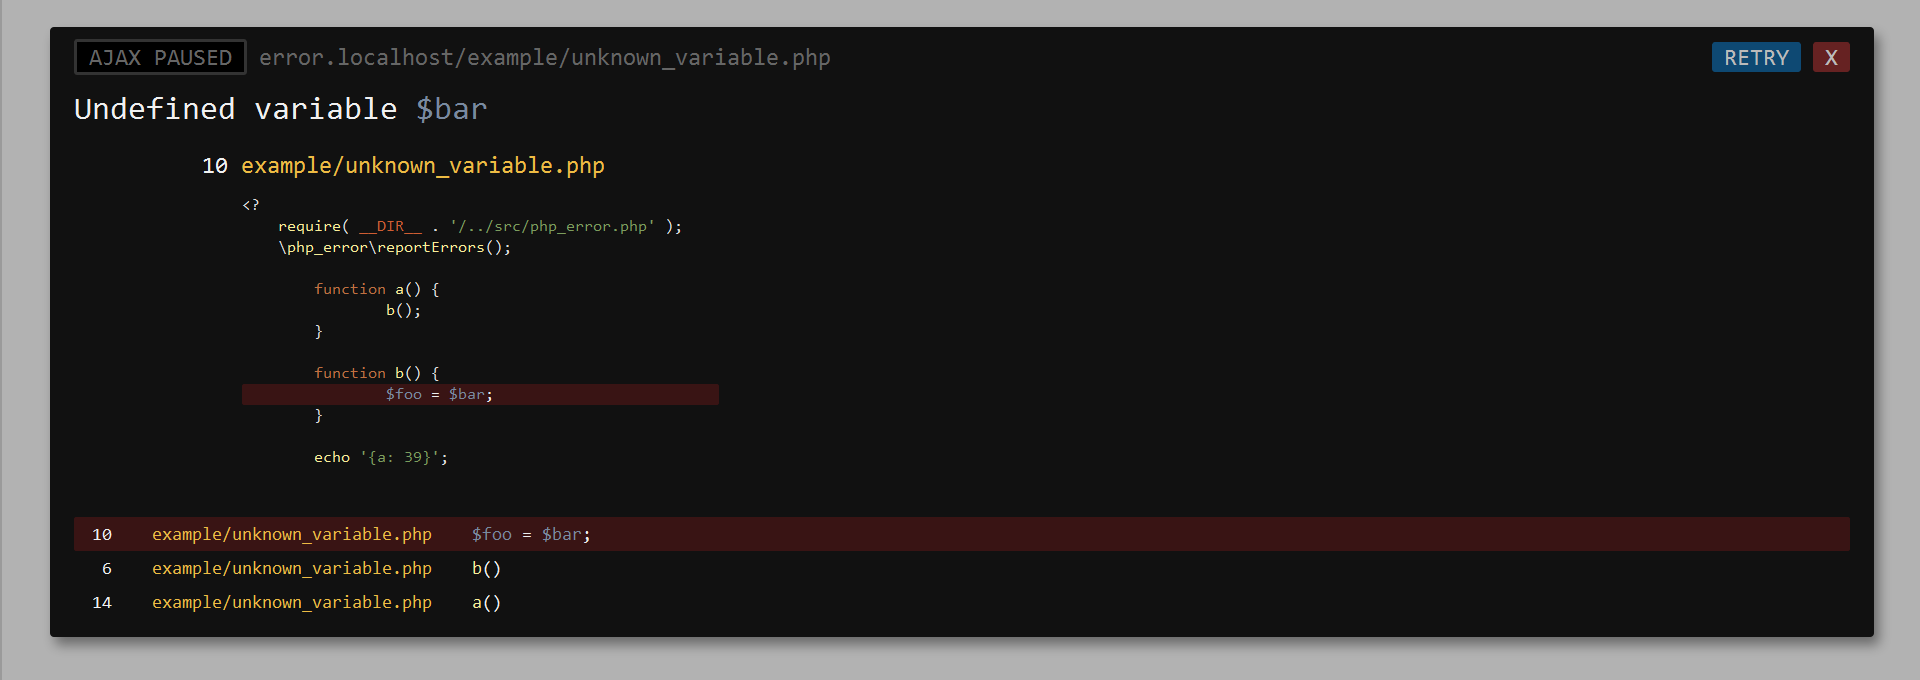 ajax server stack trace